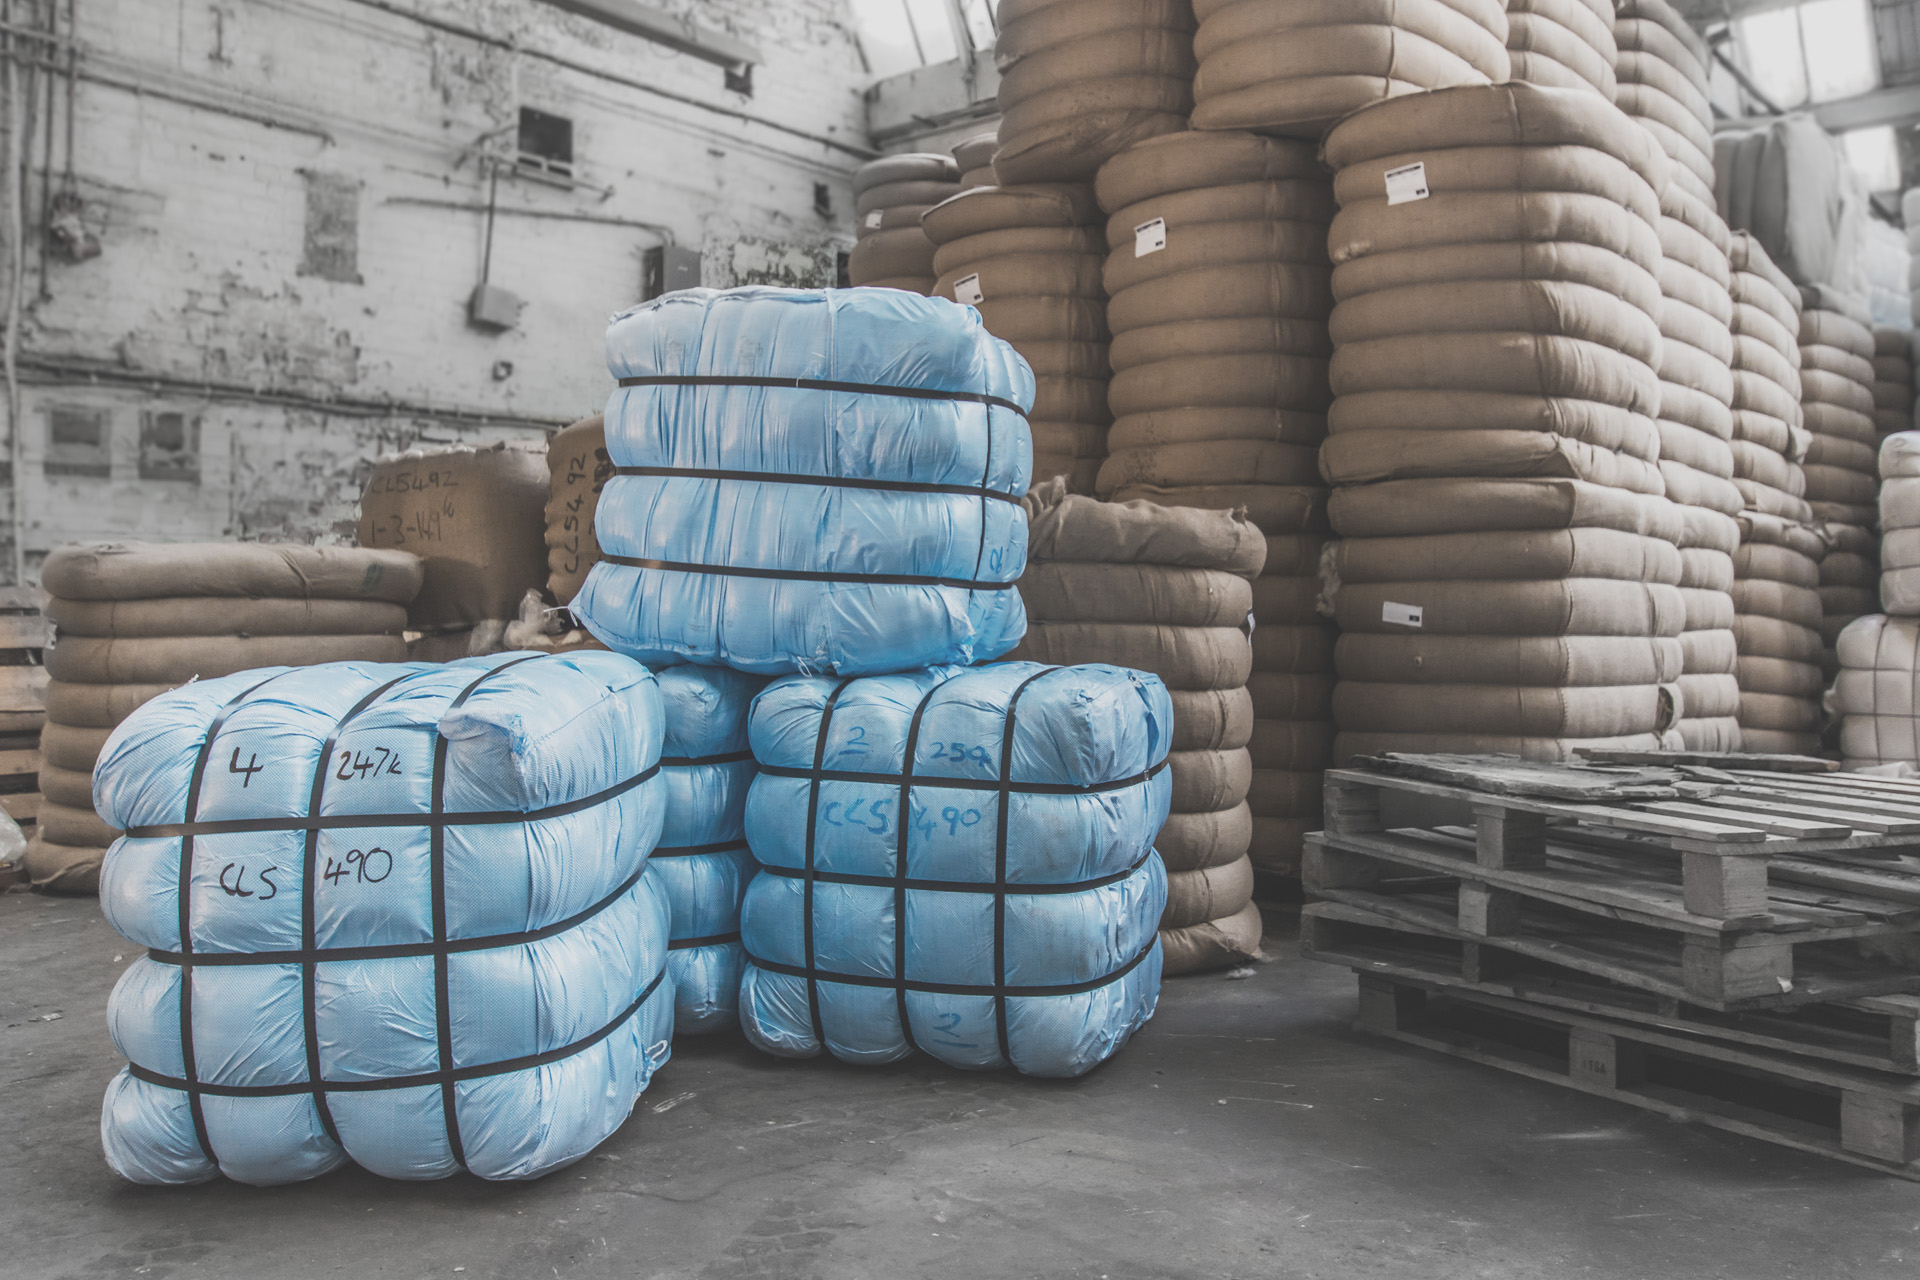 IMT-UK-LTD-cashmere-wool-mohair-fibre-alpaca-natural-fibres-worldwide-distributor-of-textilesjpg